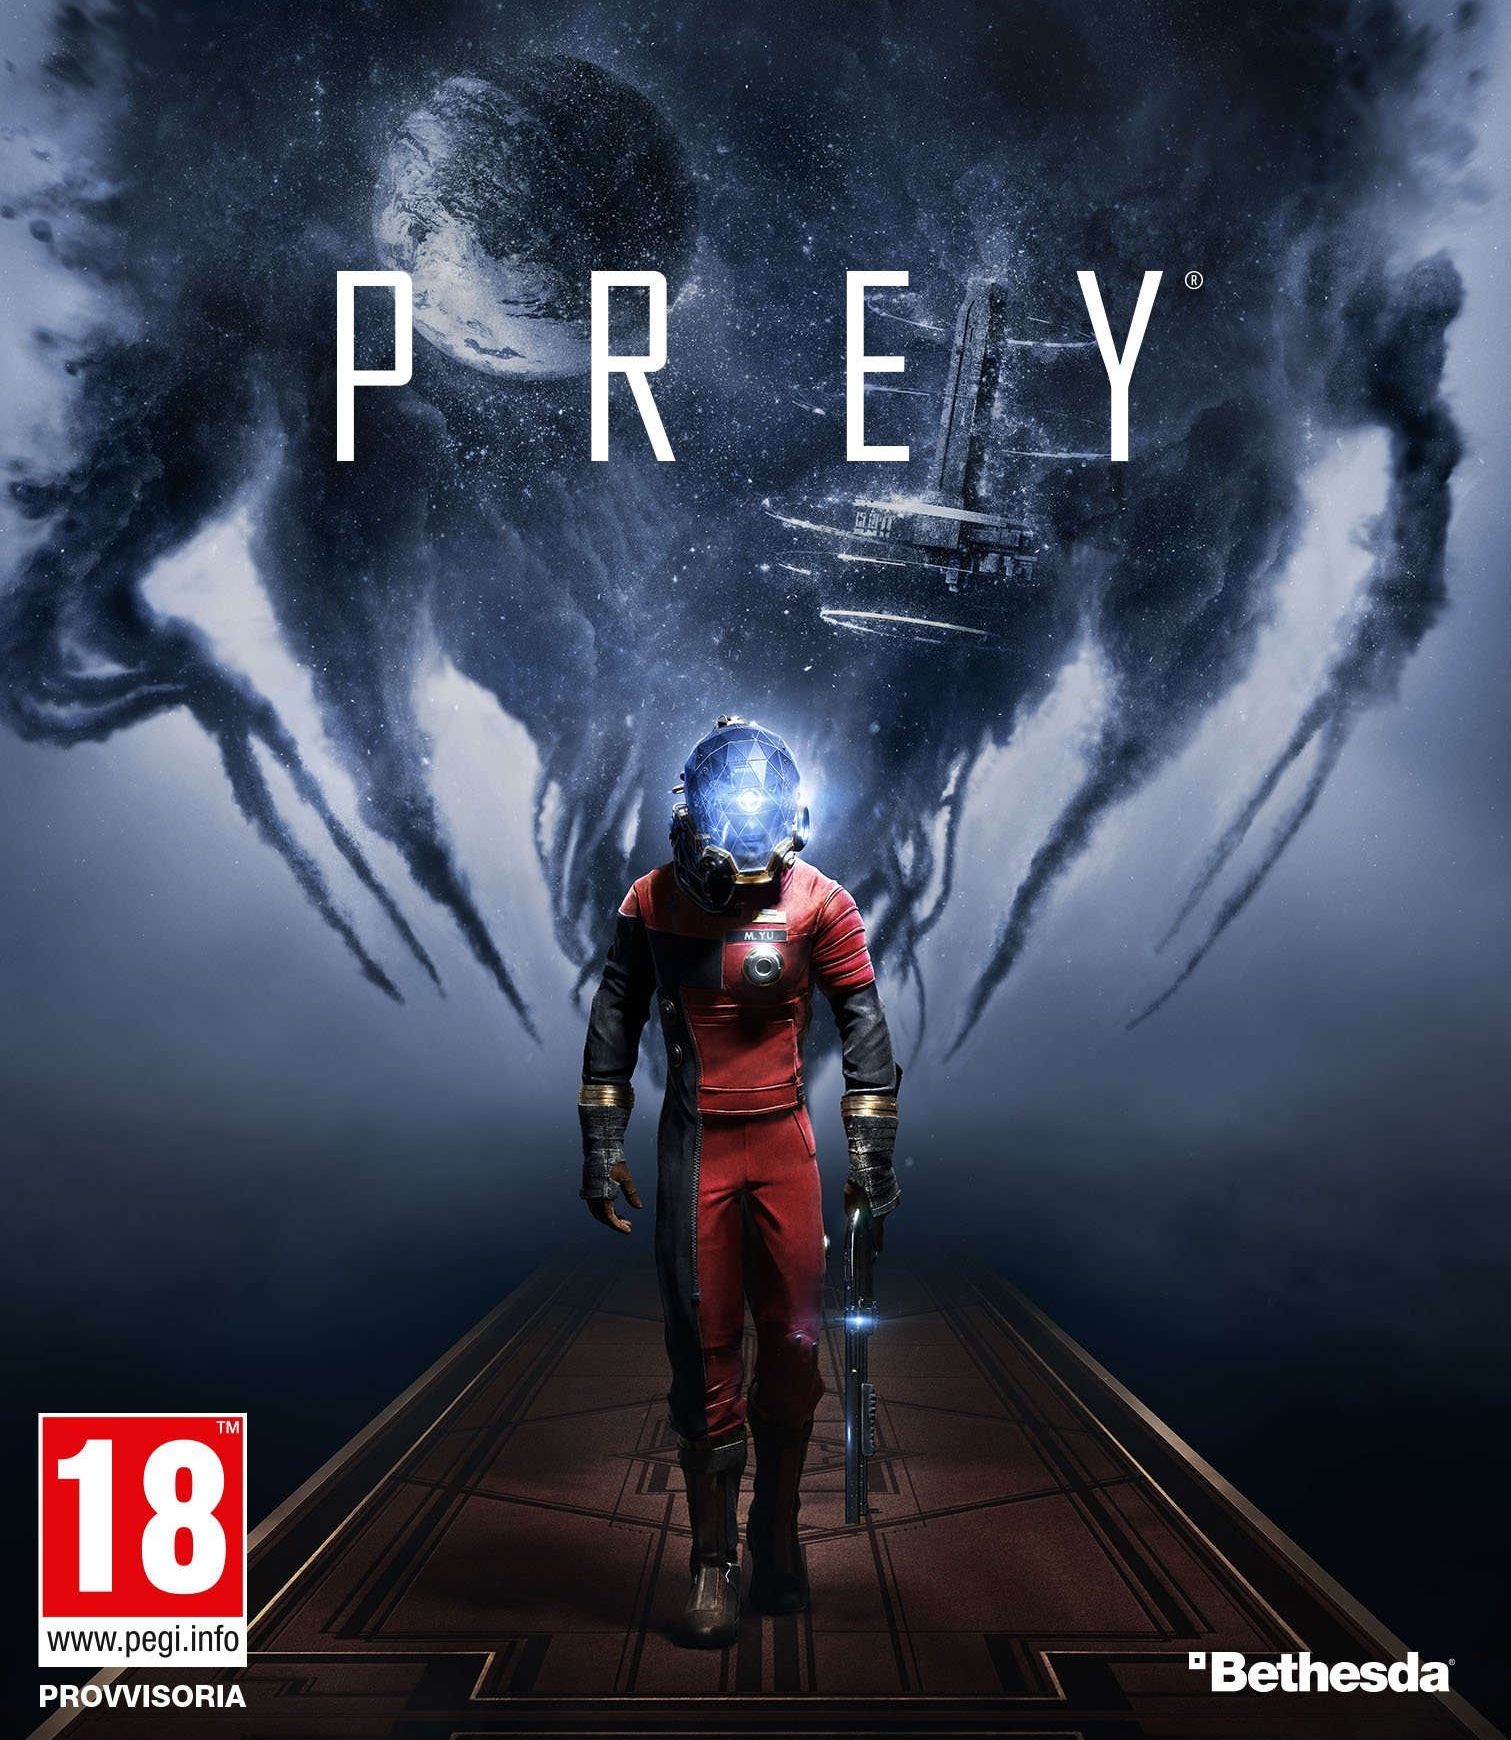 prey_one_frontcover_puaueu.jpg